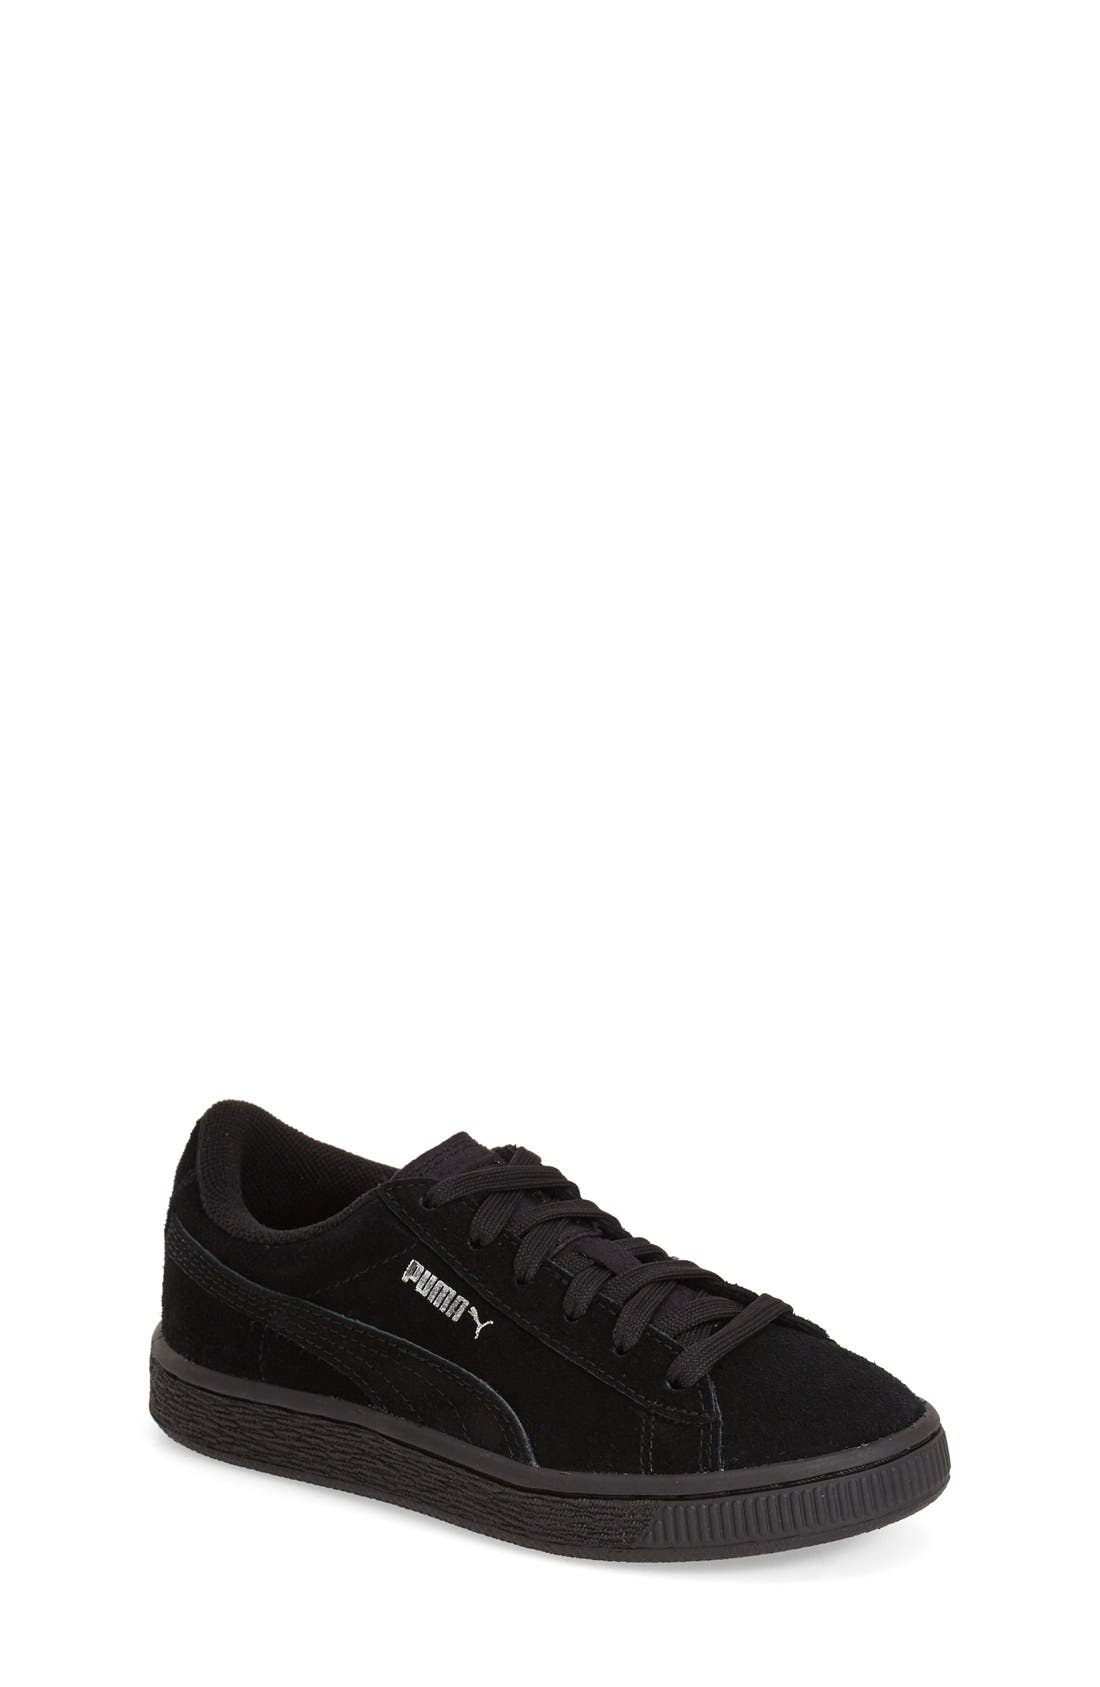 'Suede'Sneaker,                             Main thumbnail 1, color,                             001